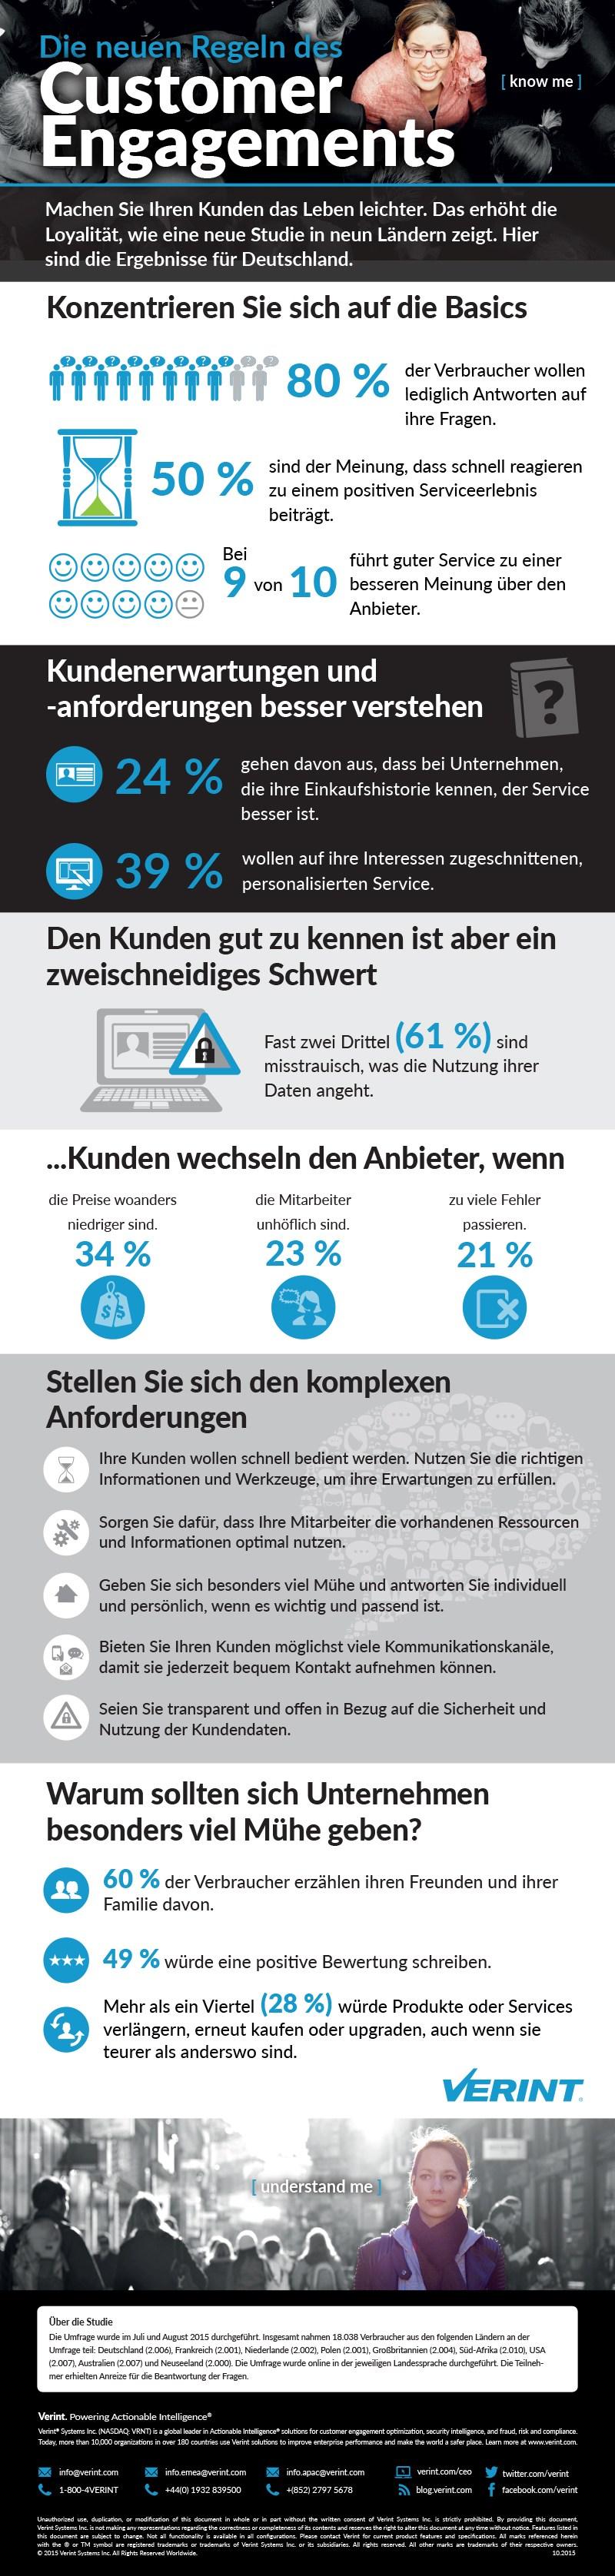 infografik verint customer engagements